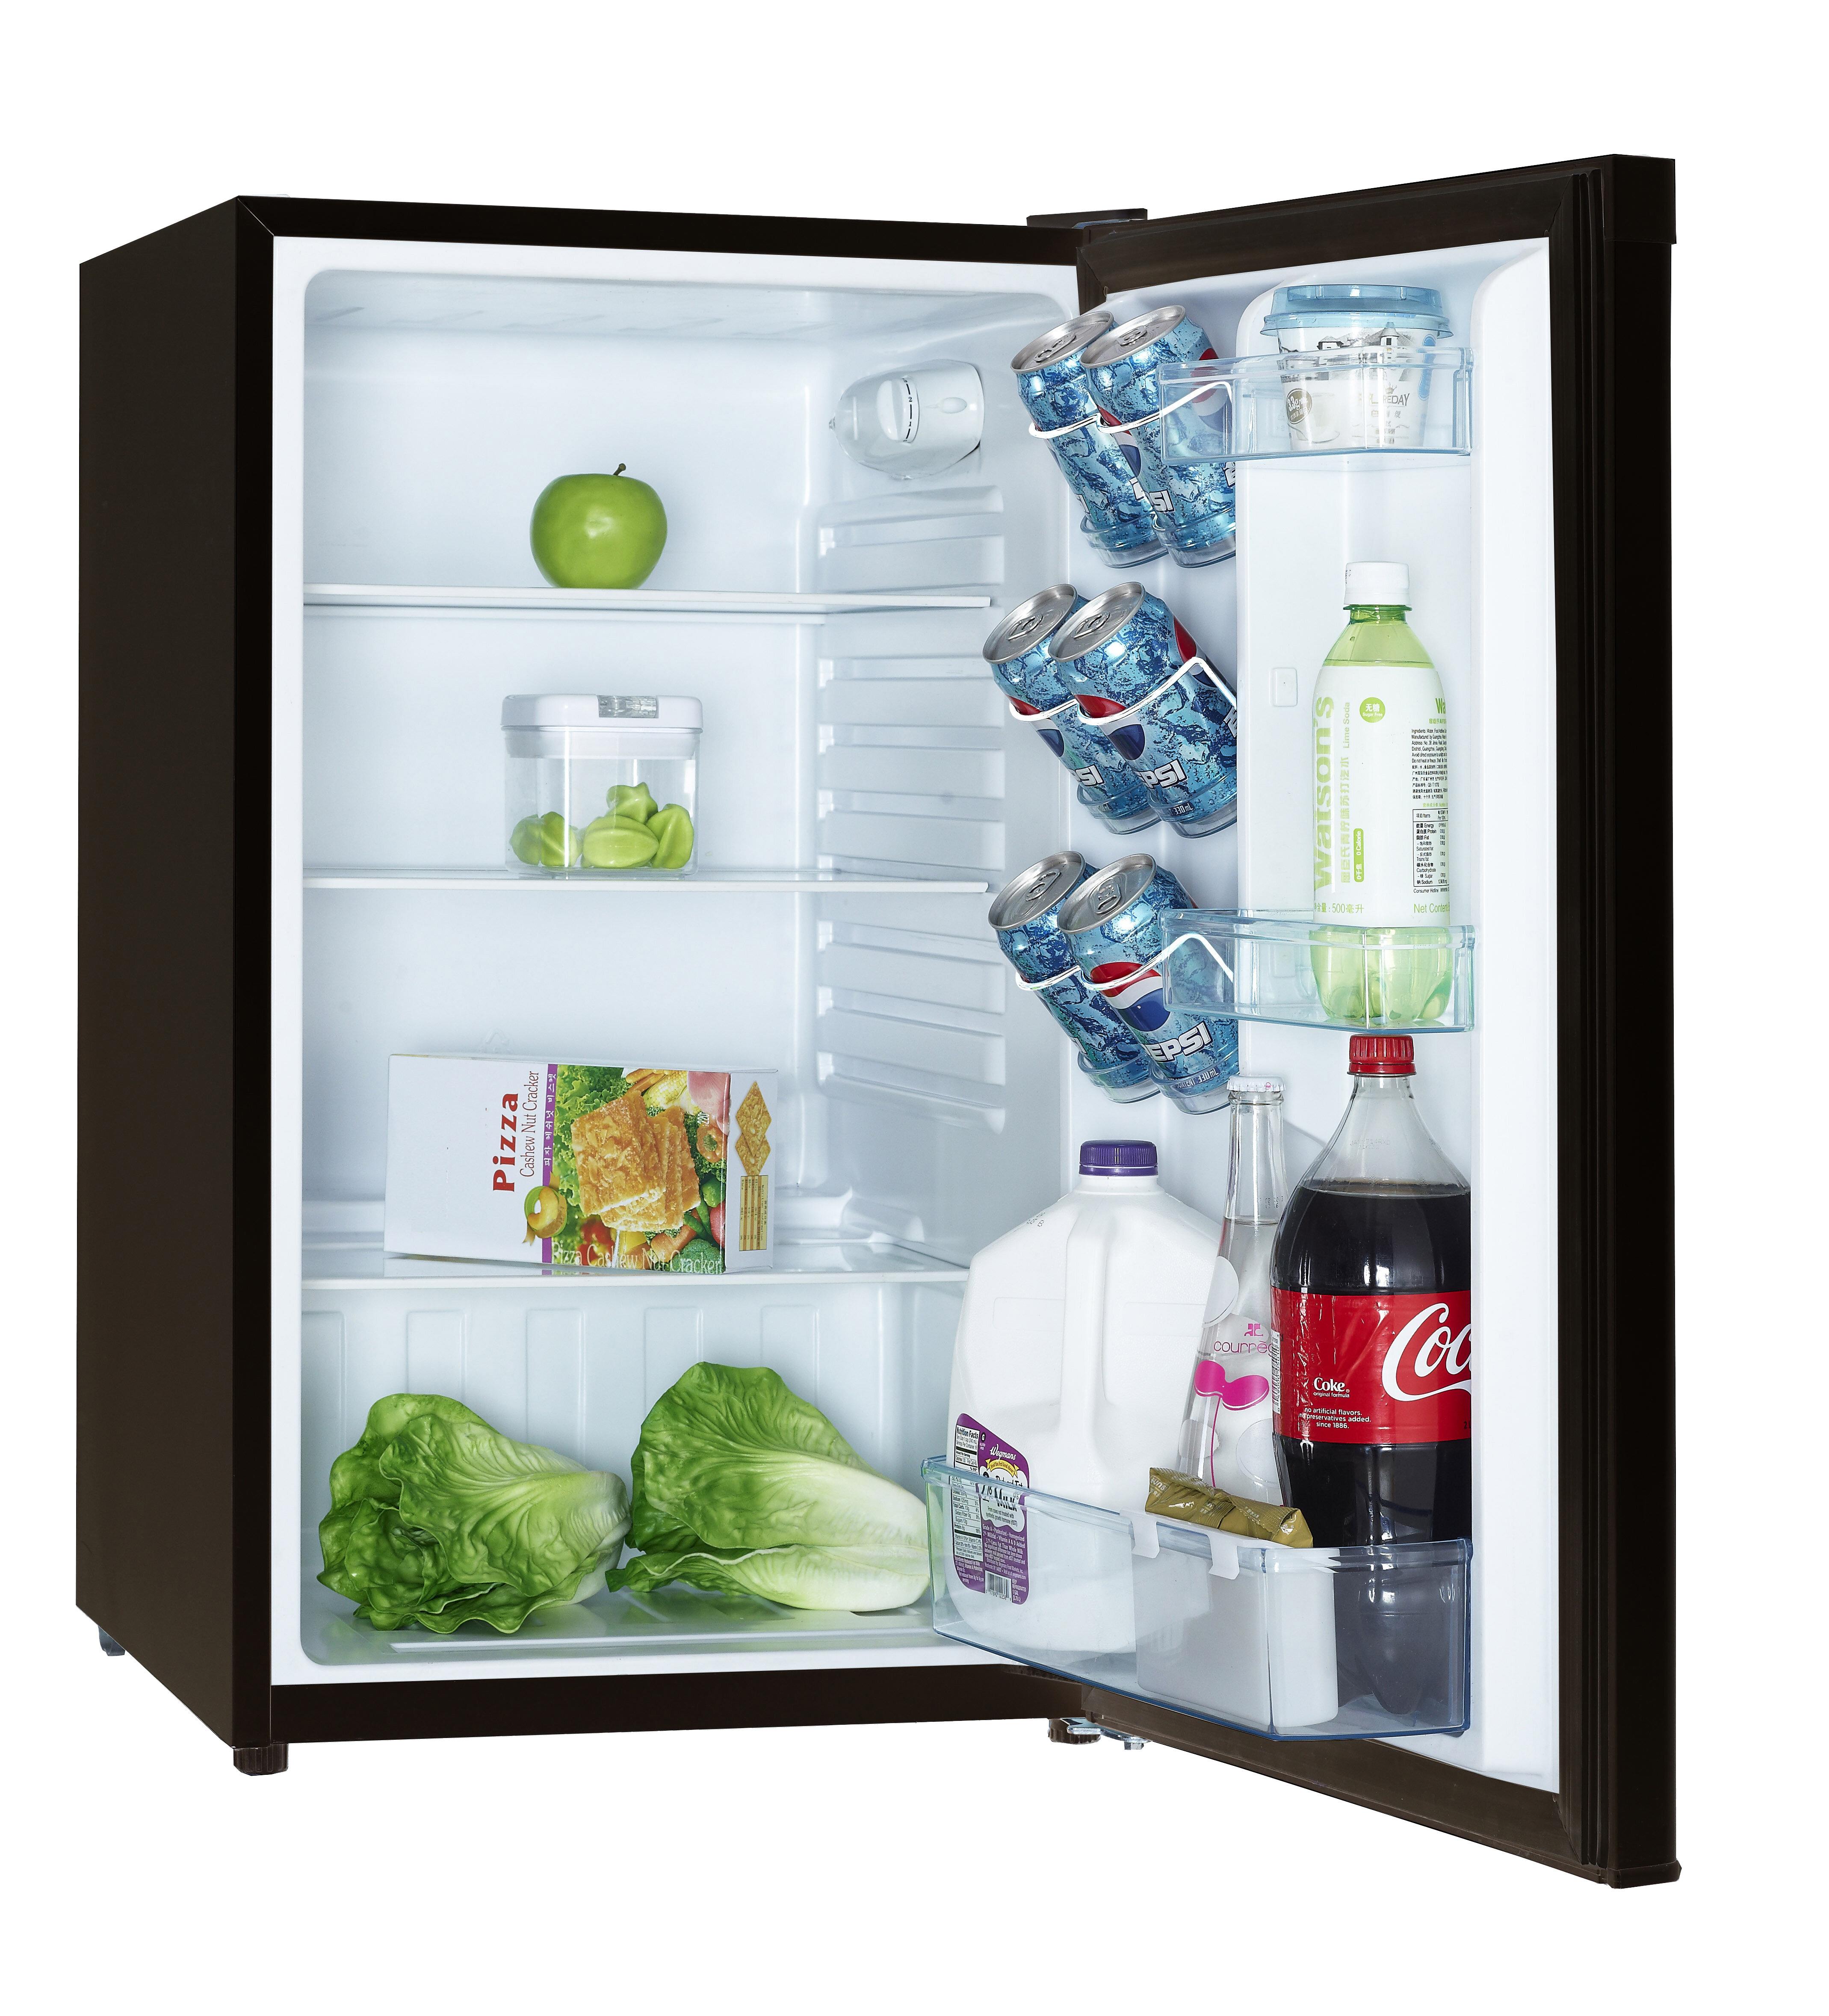 Avanti 4.4 cu. ft. Compact Refrigerator & Reviews   Wayfair